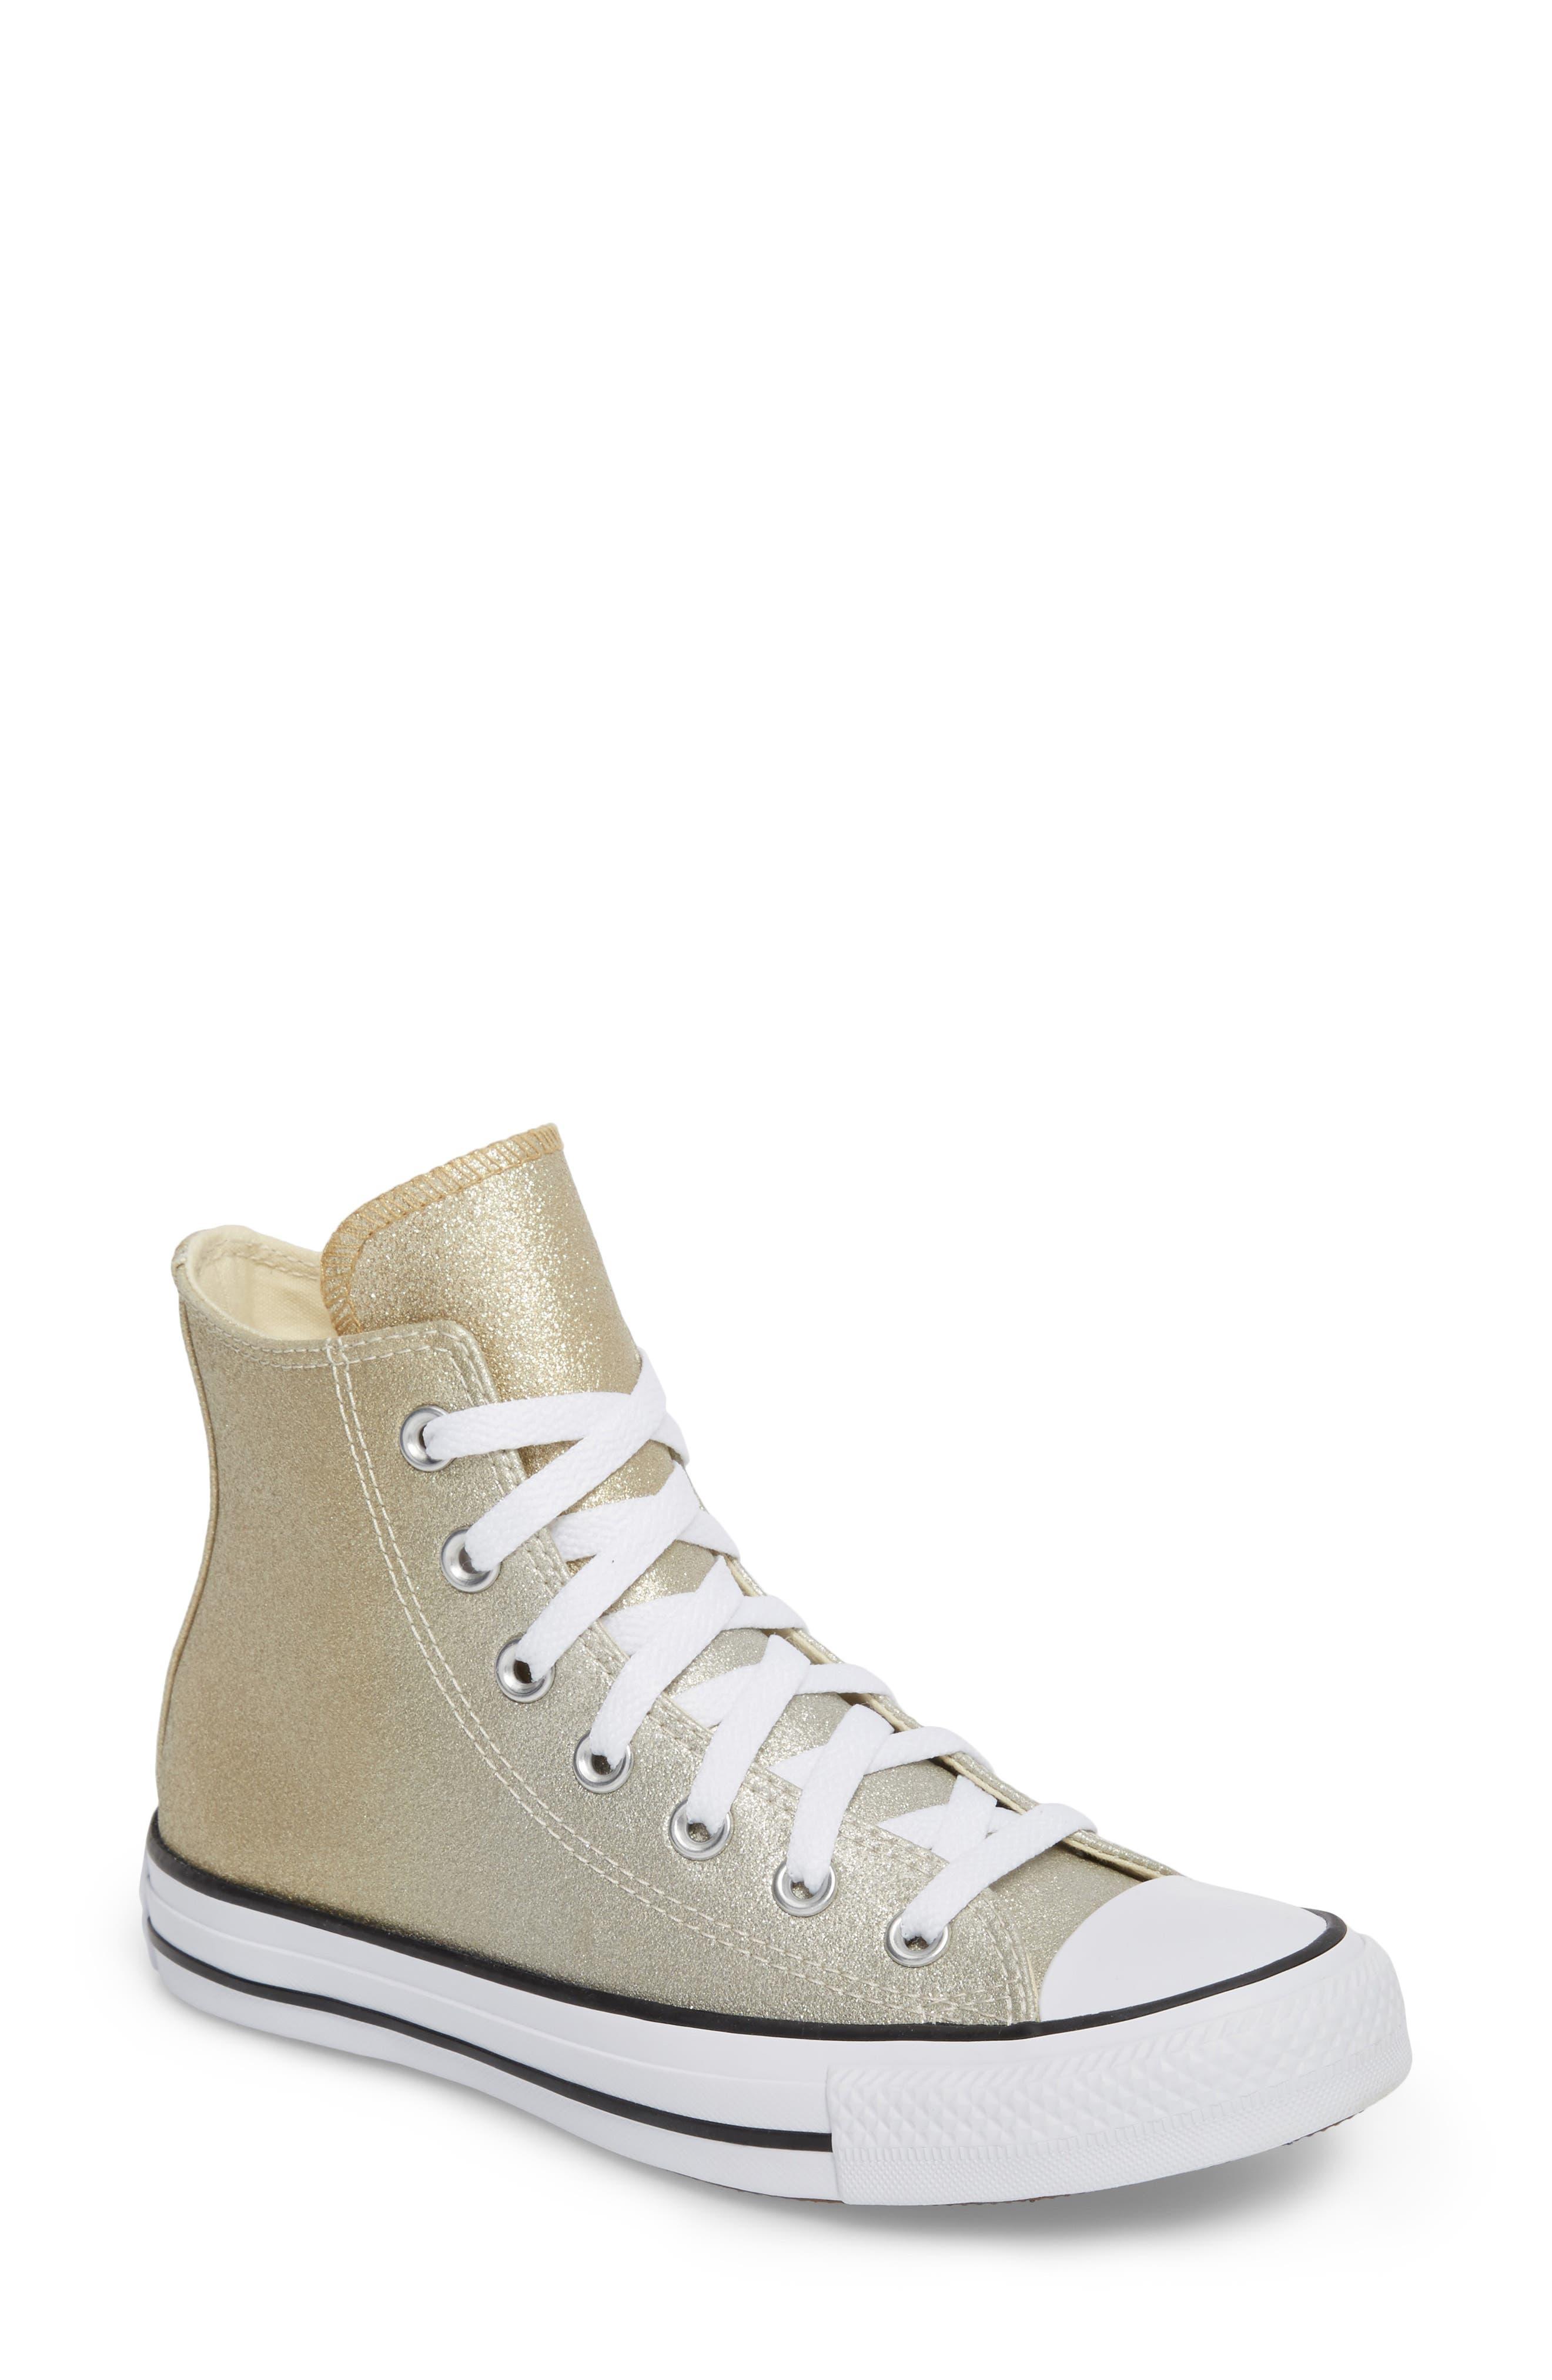 Alternate Image 1 Selected - Converse Chuck Taylor® All Star® Ombré Metallic High Top Sneaker (Women)